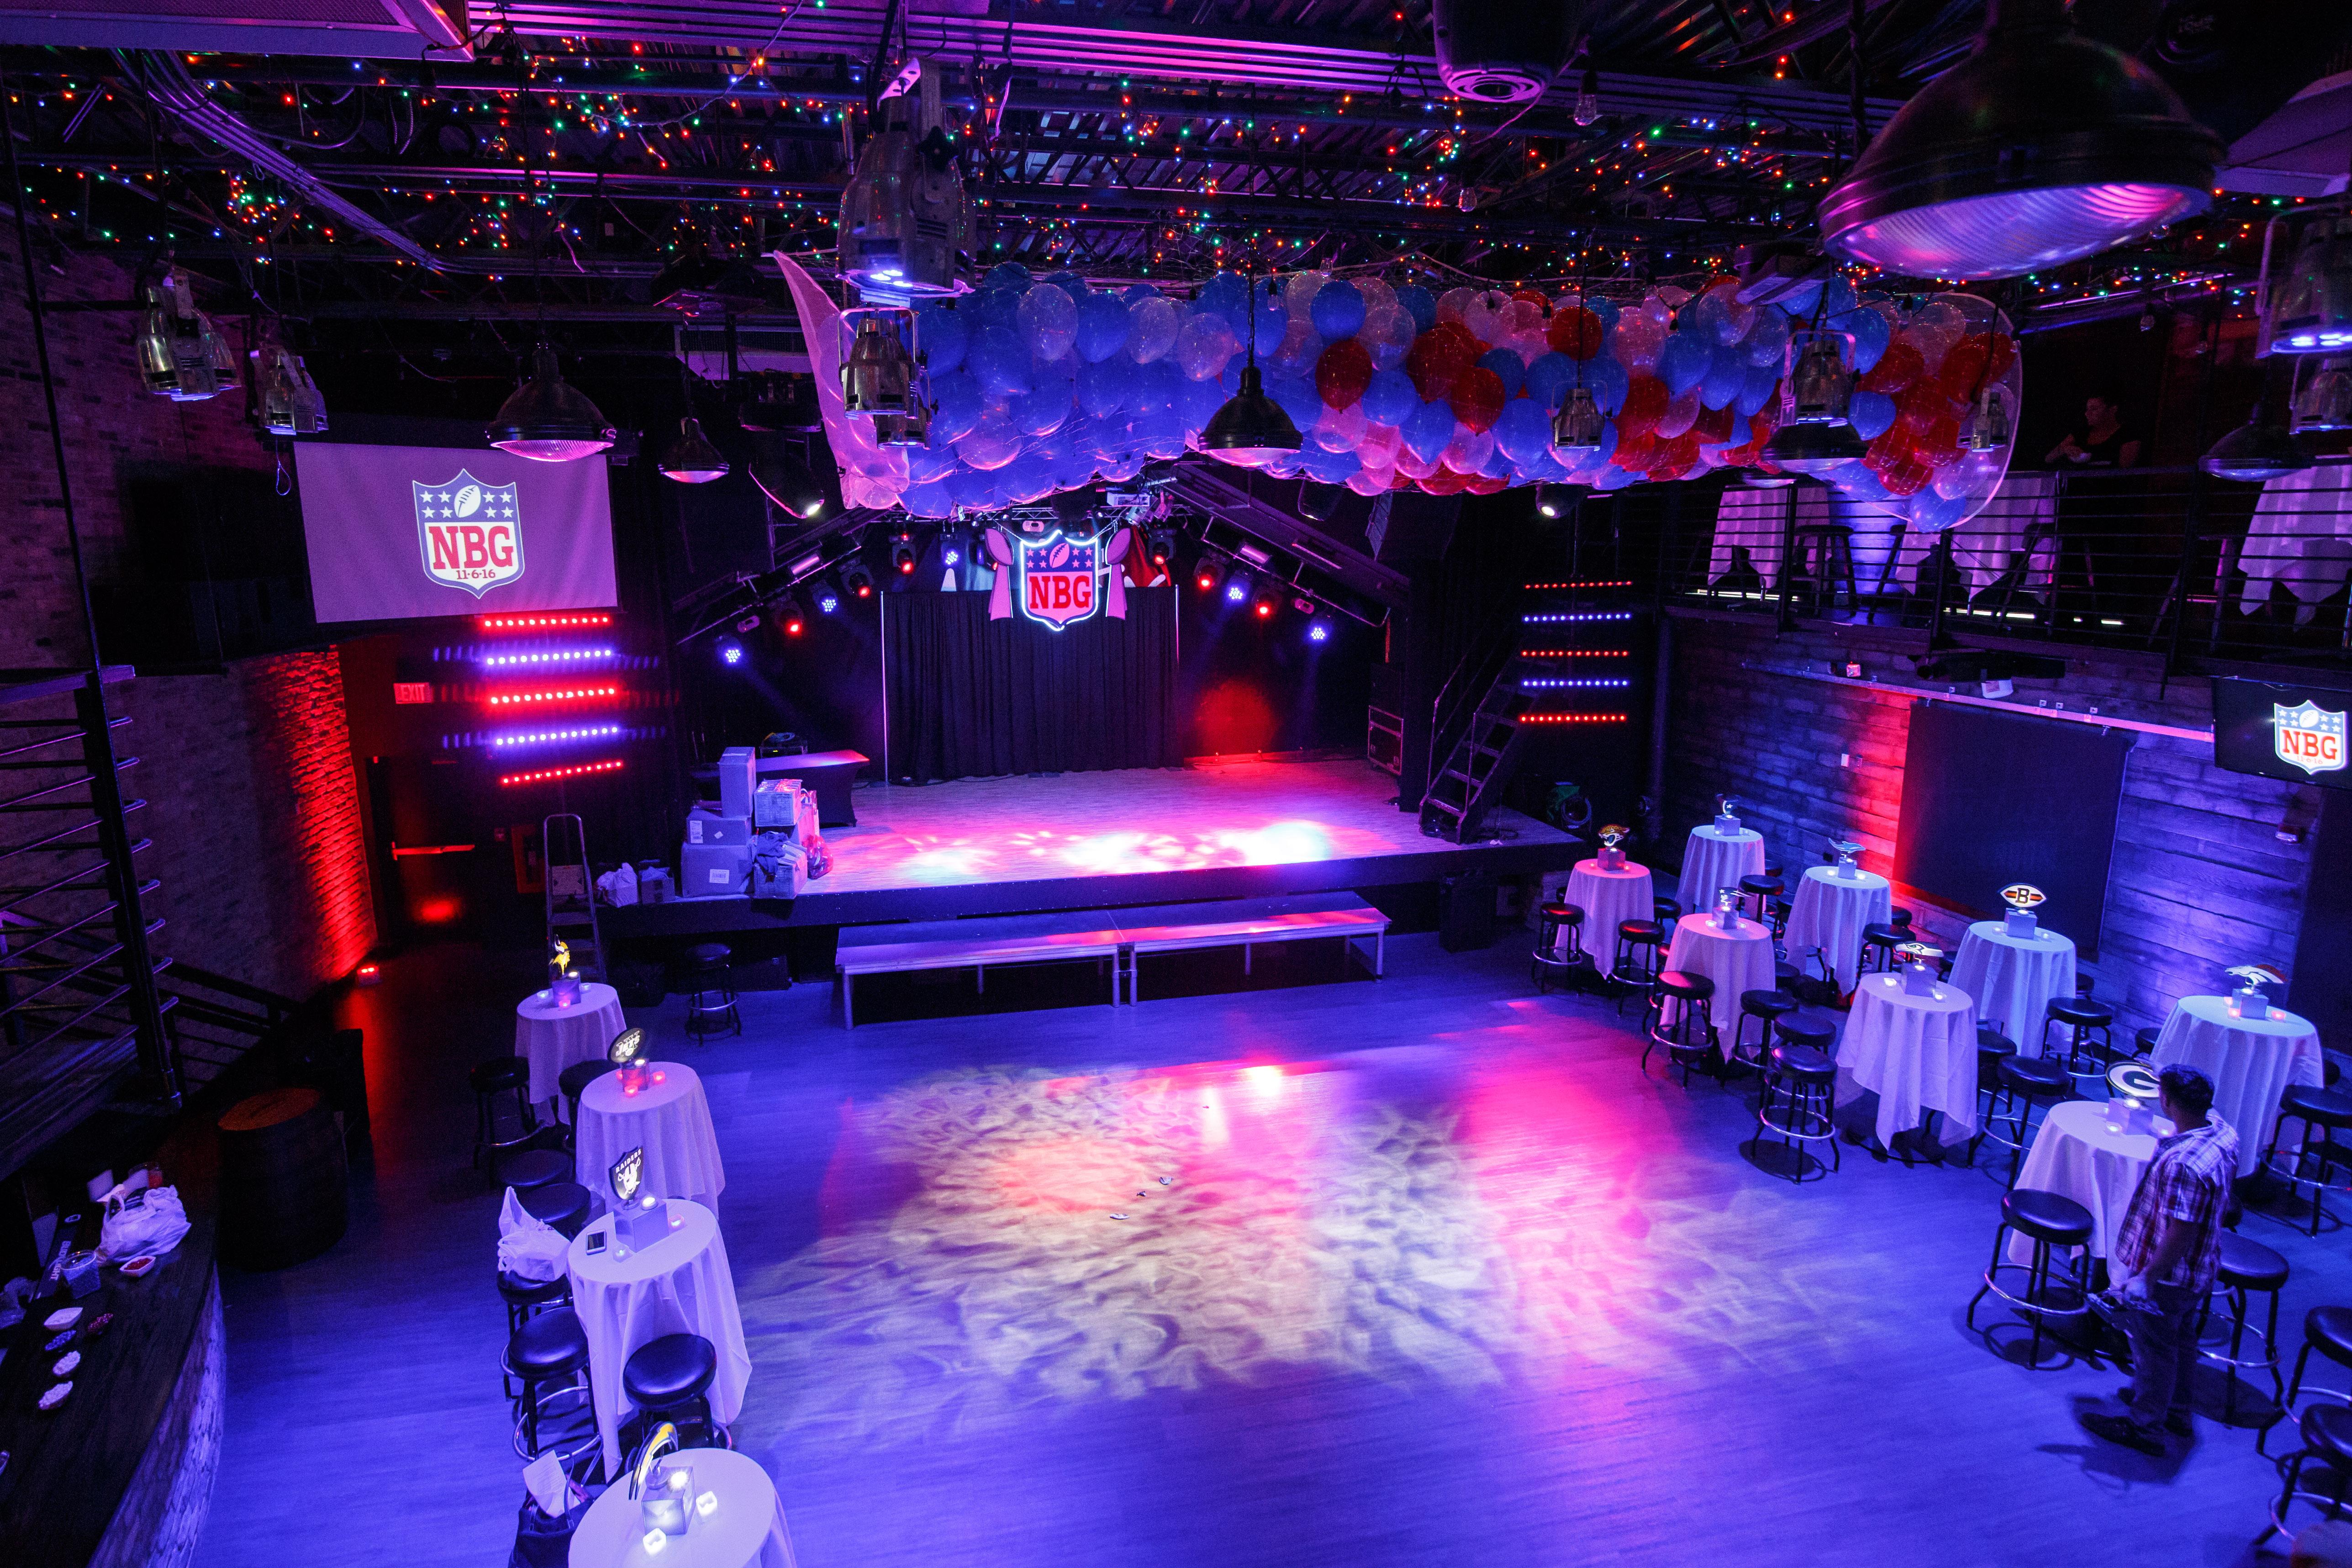 NFL Theme Bar Mitzvah - Flow Entertainment, Inc